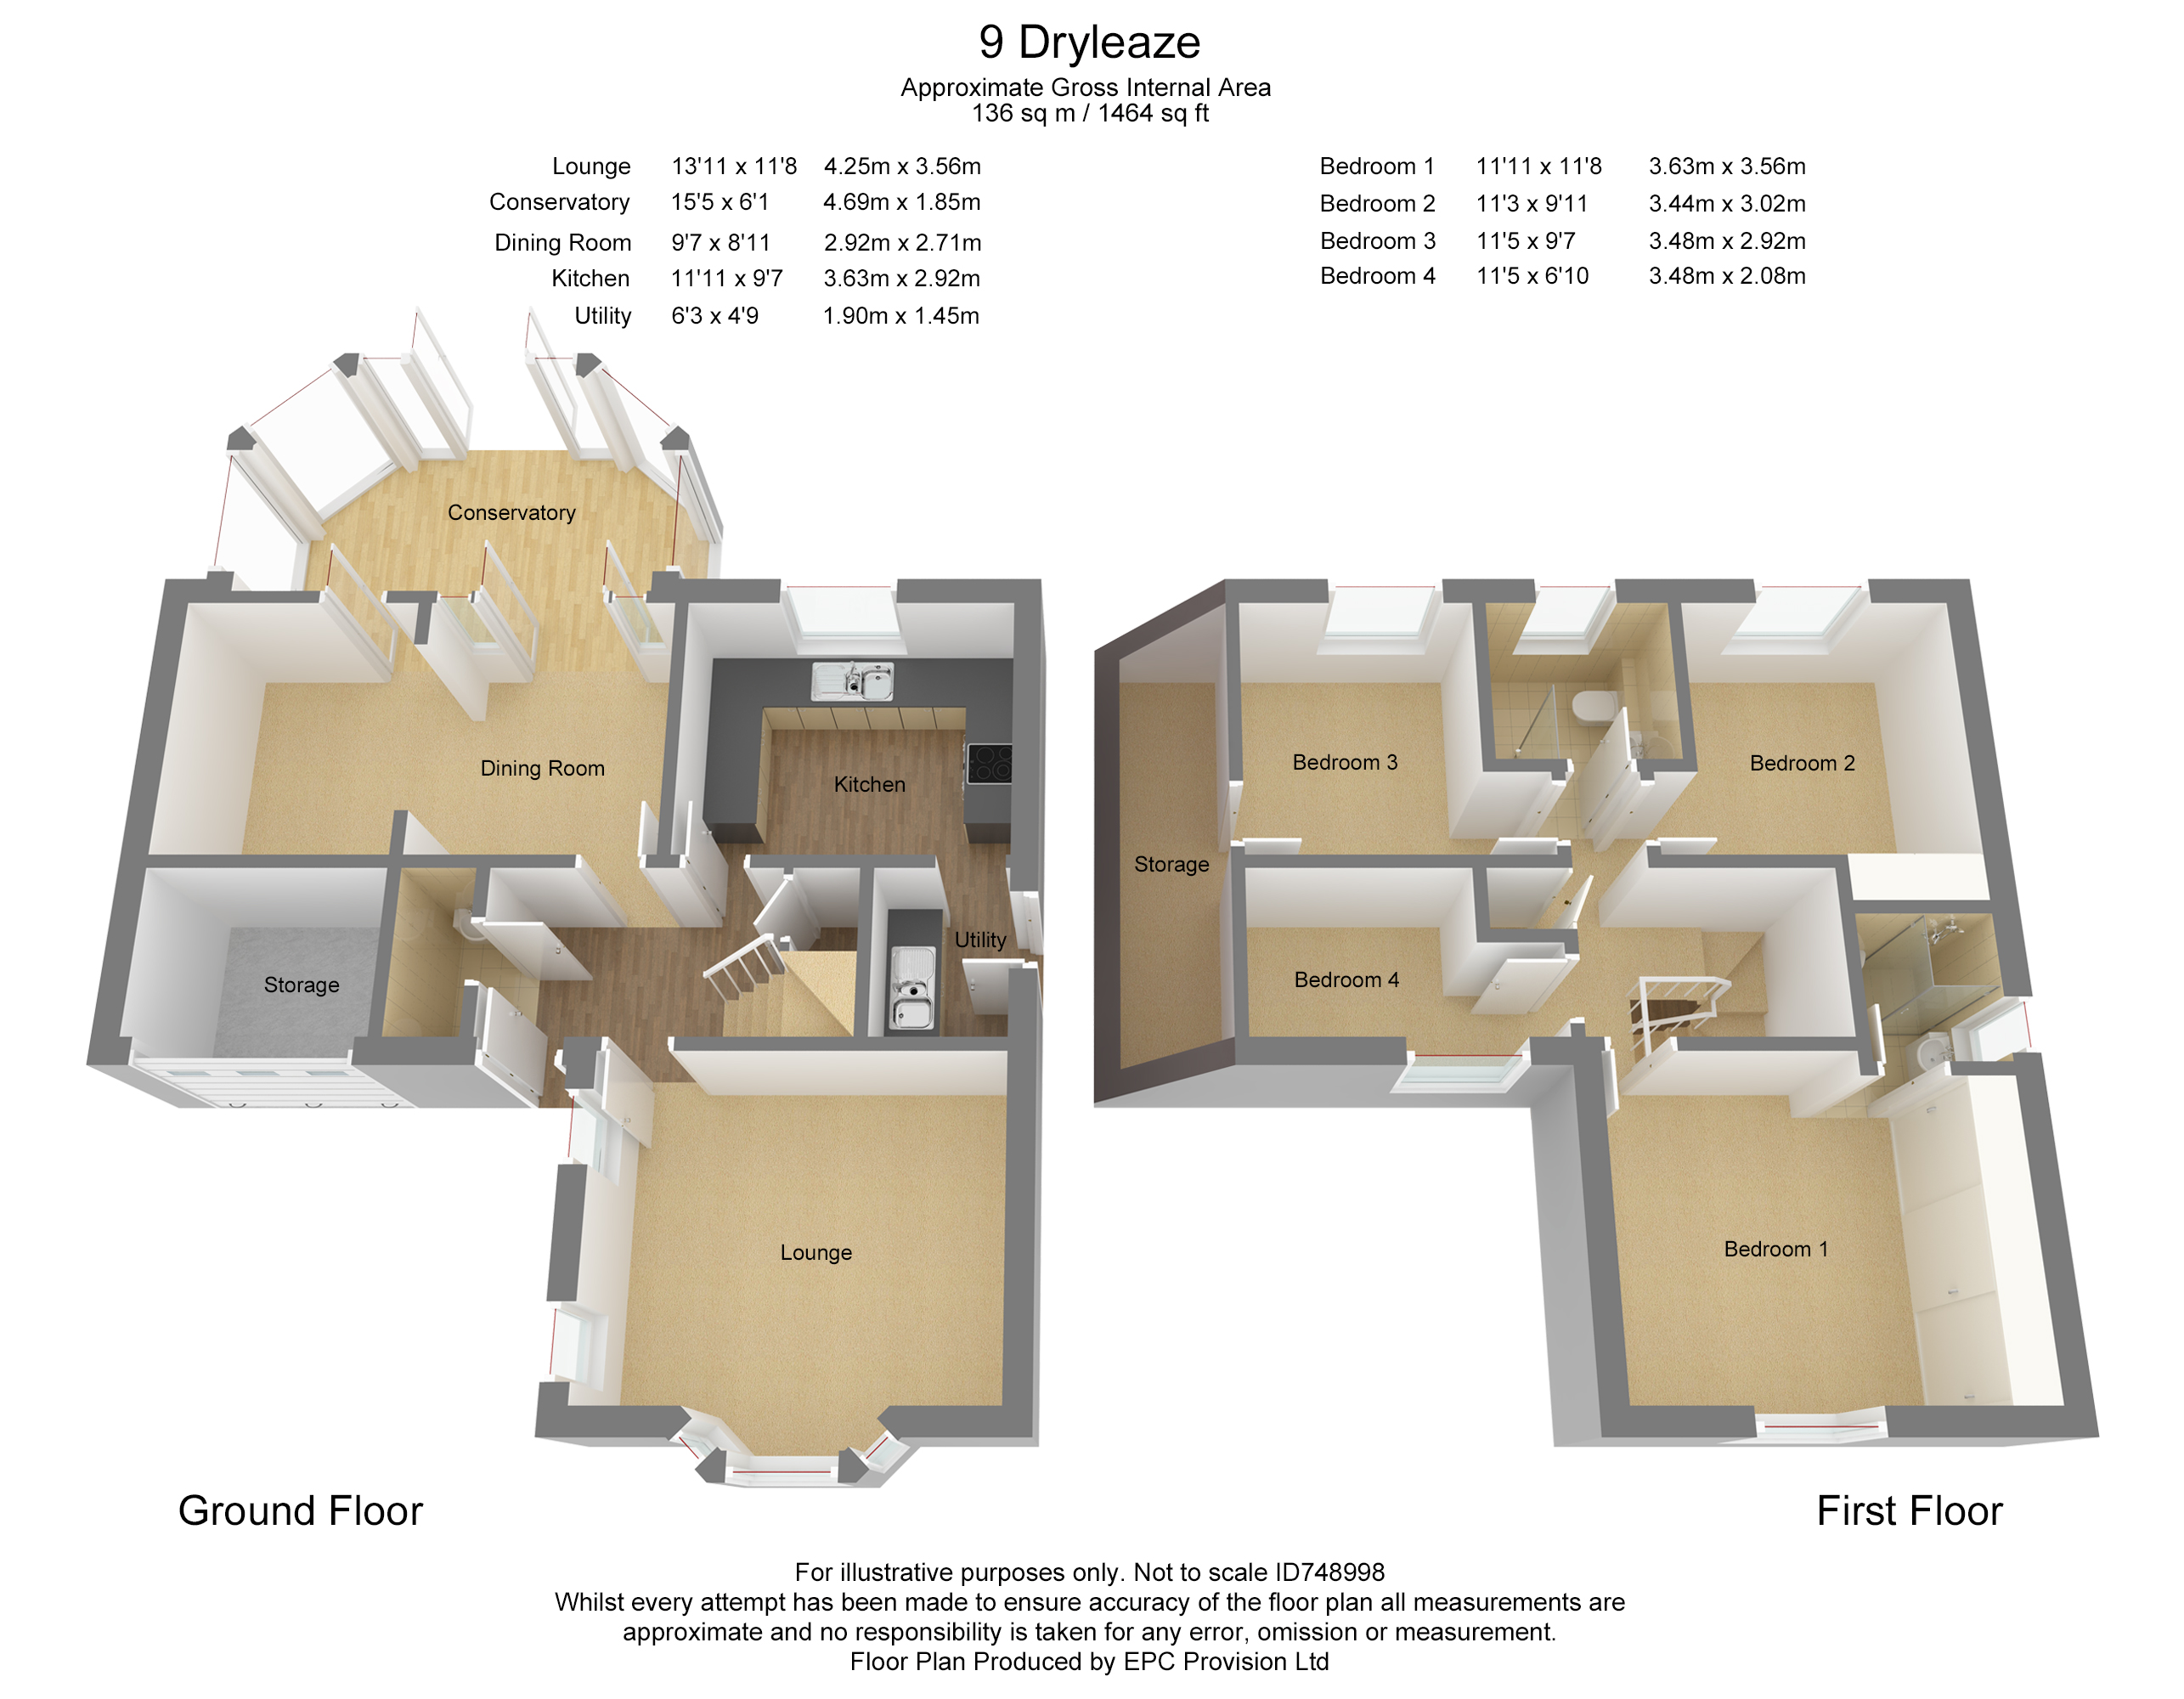 Floorplan for Dryleaze, Yate.